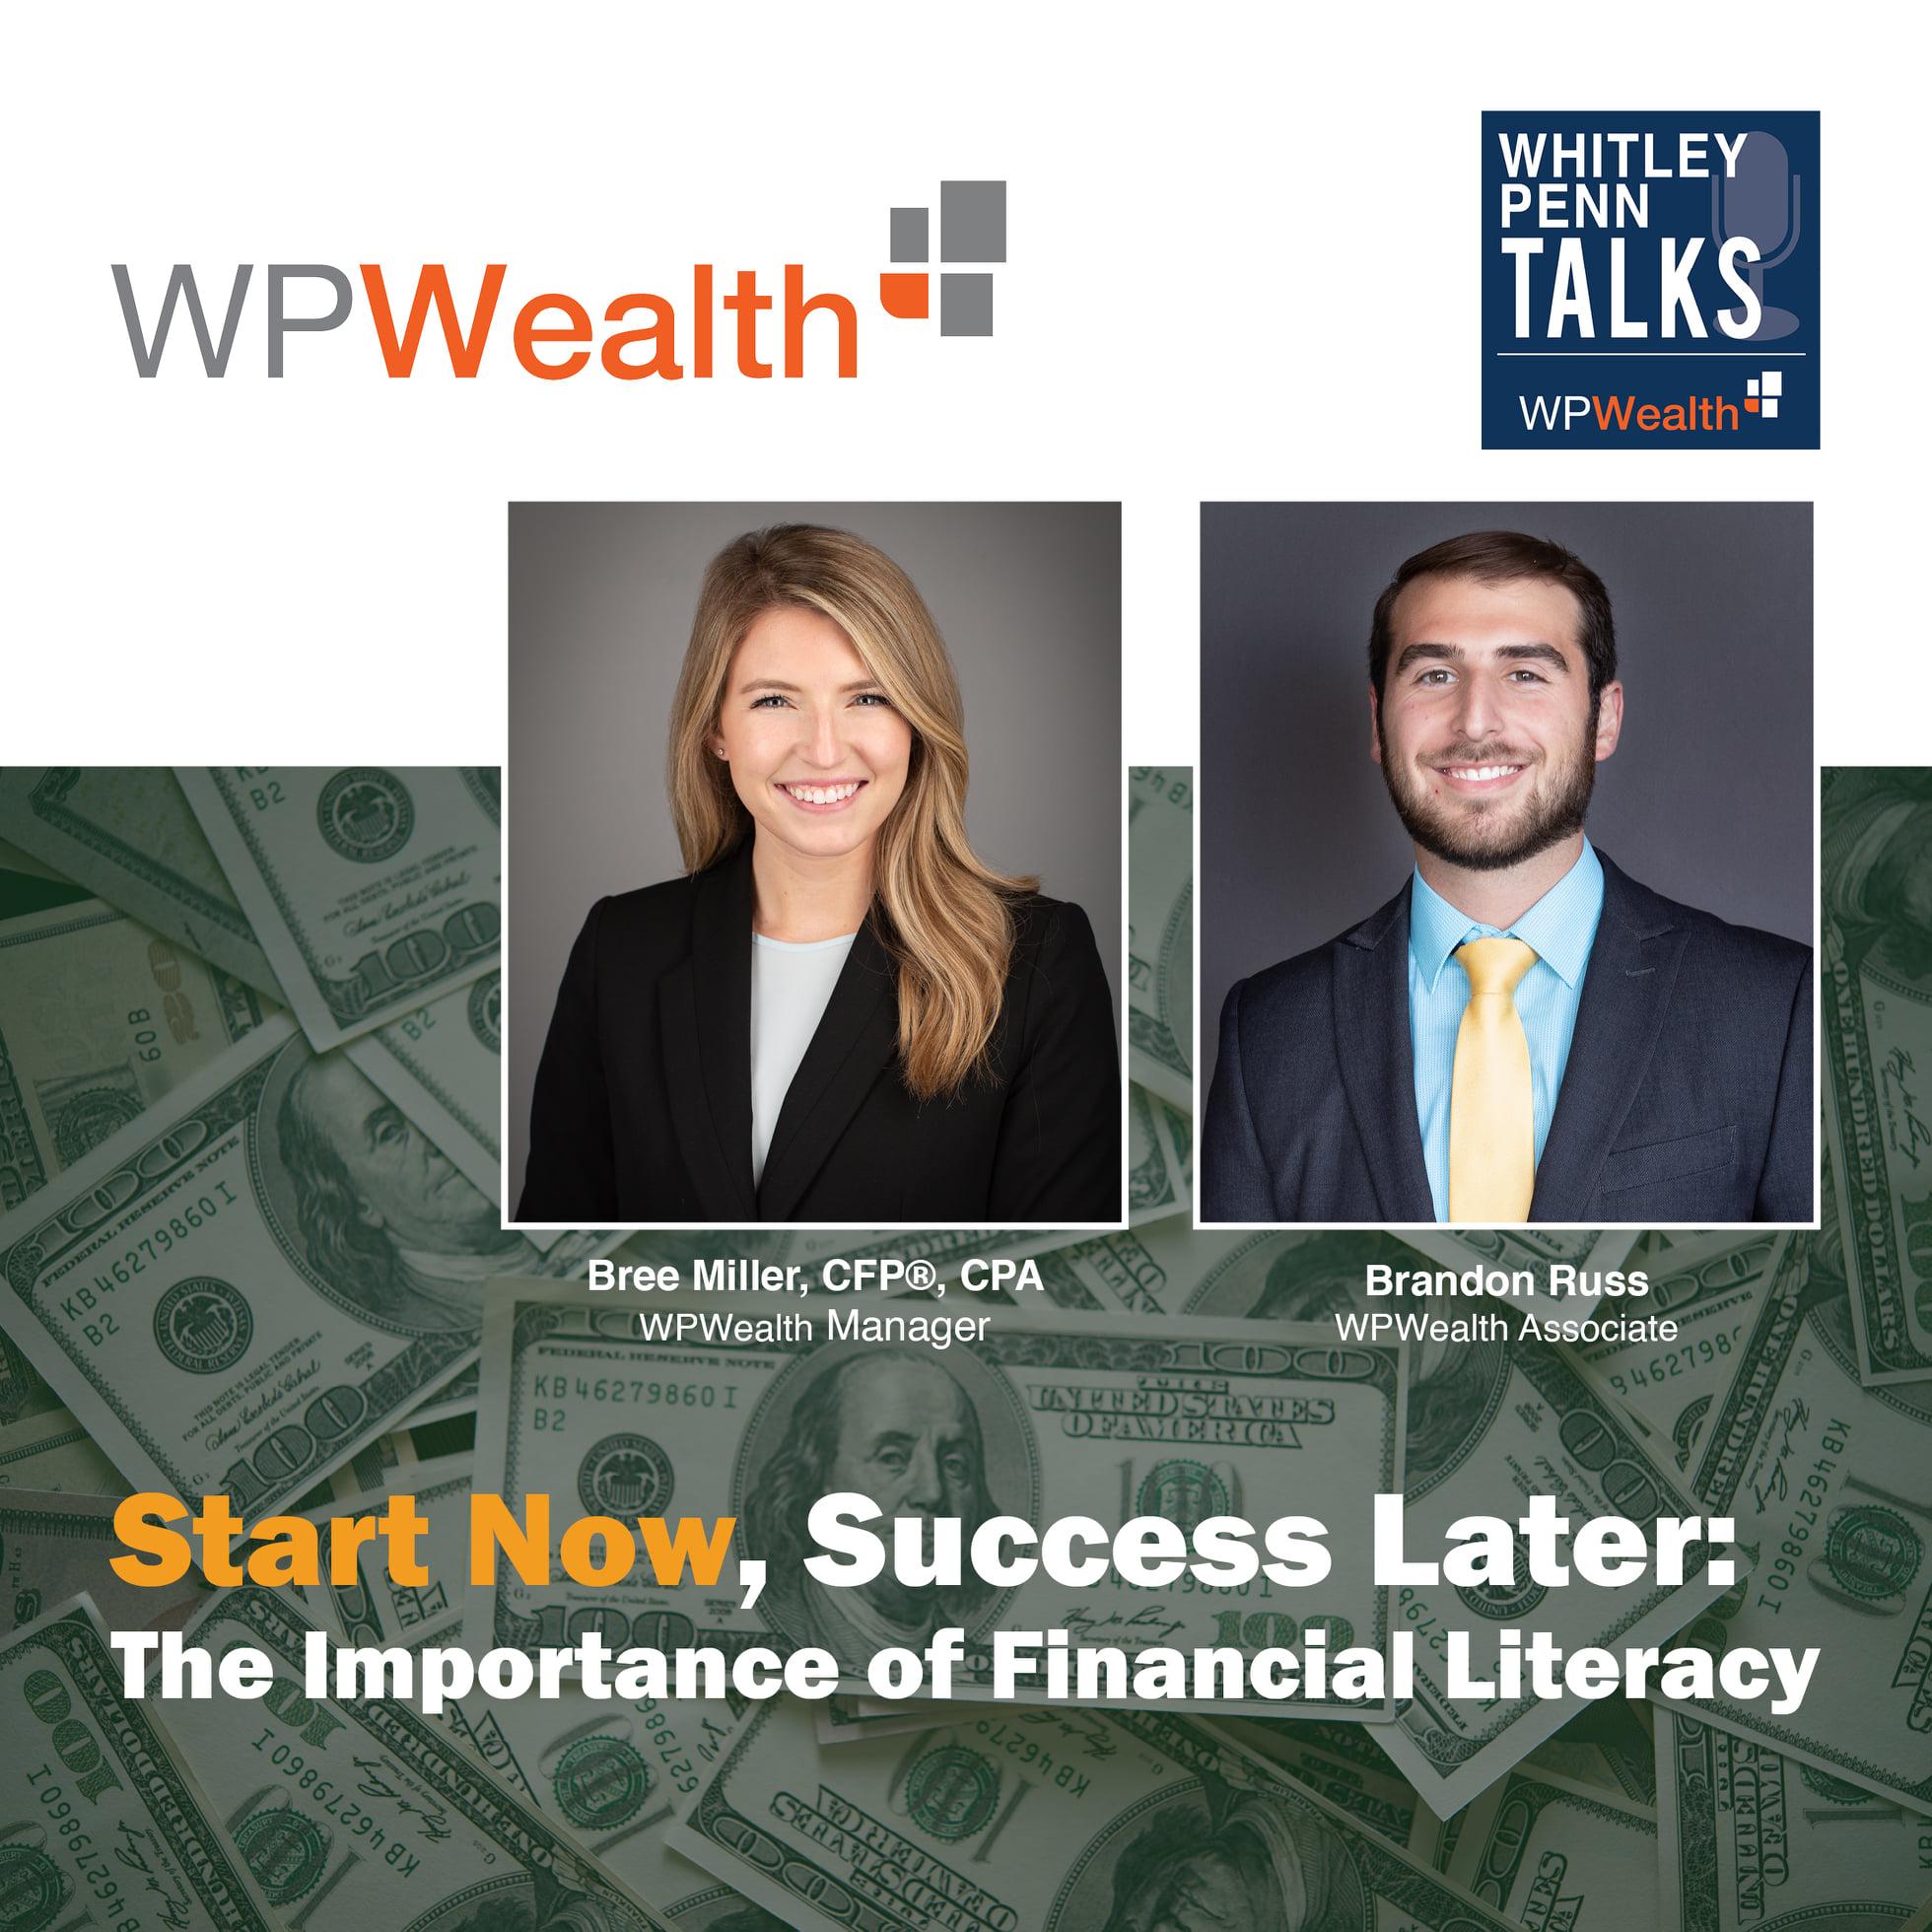 Whitley Penn Talks Financial Literacy Podcast